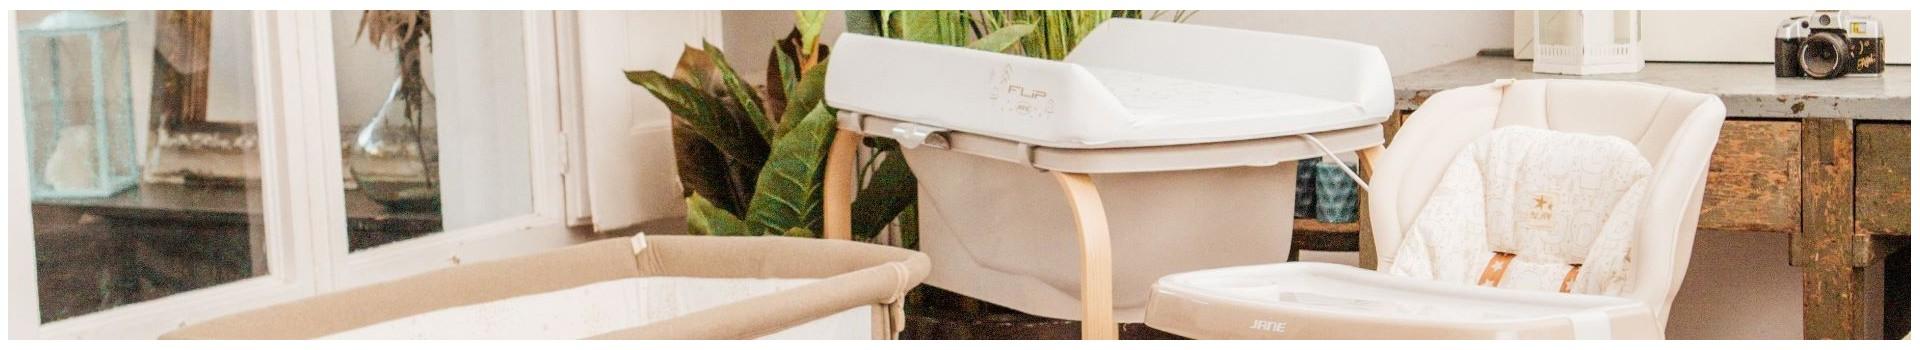 Mobiliario para habitación de bebé Nature Edition | Janéworld